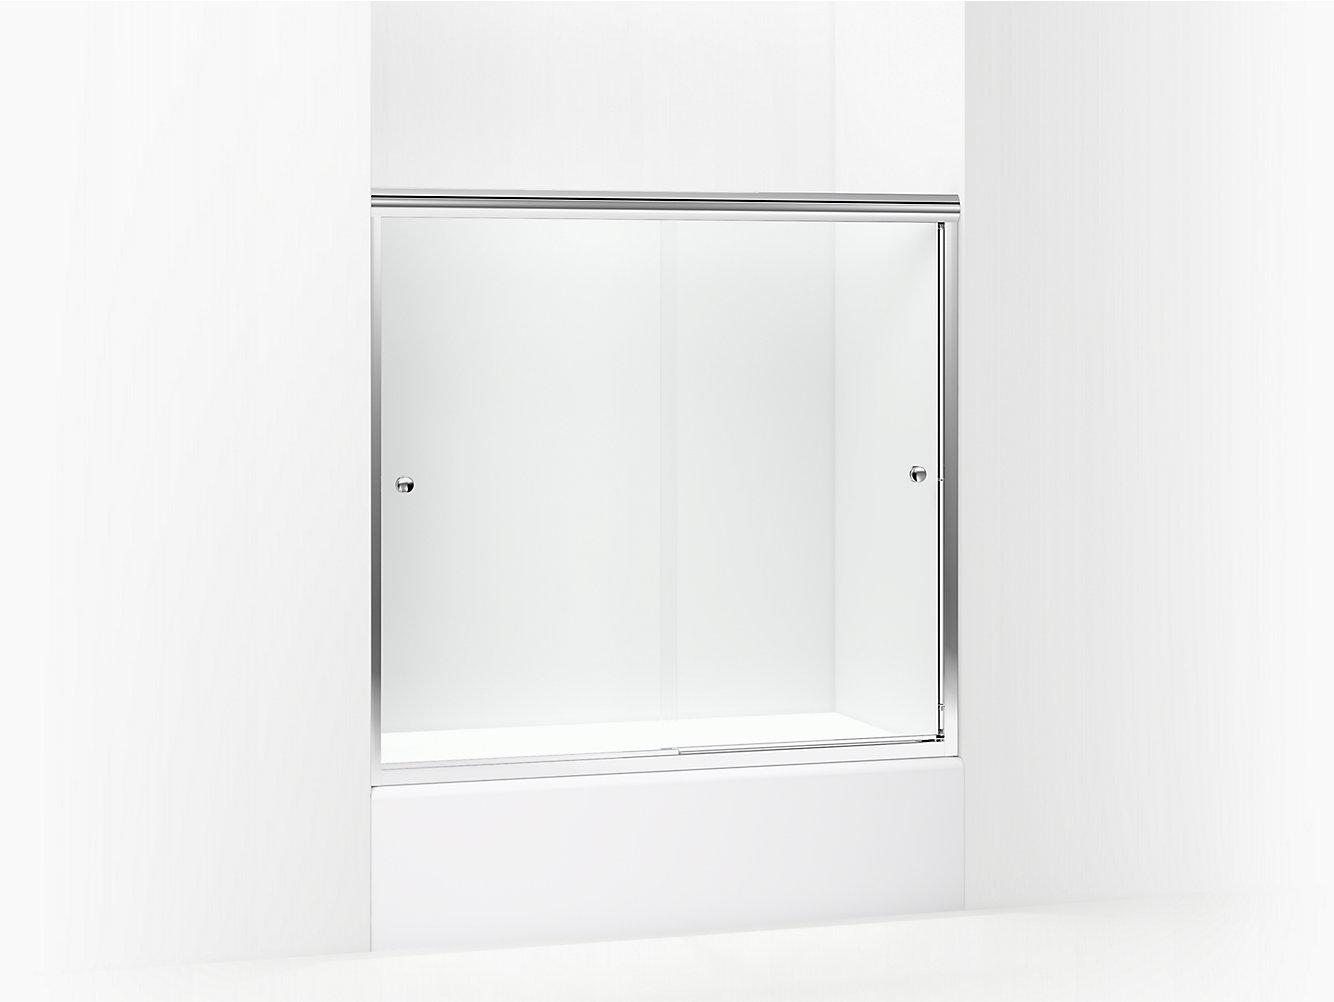 Finesse Frameless Sliding Bath Door 54 5859 58 W X 55 12 H